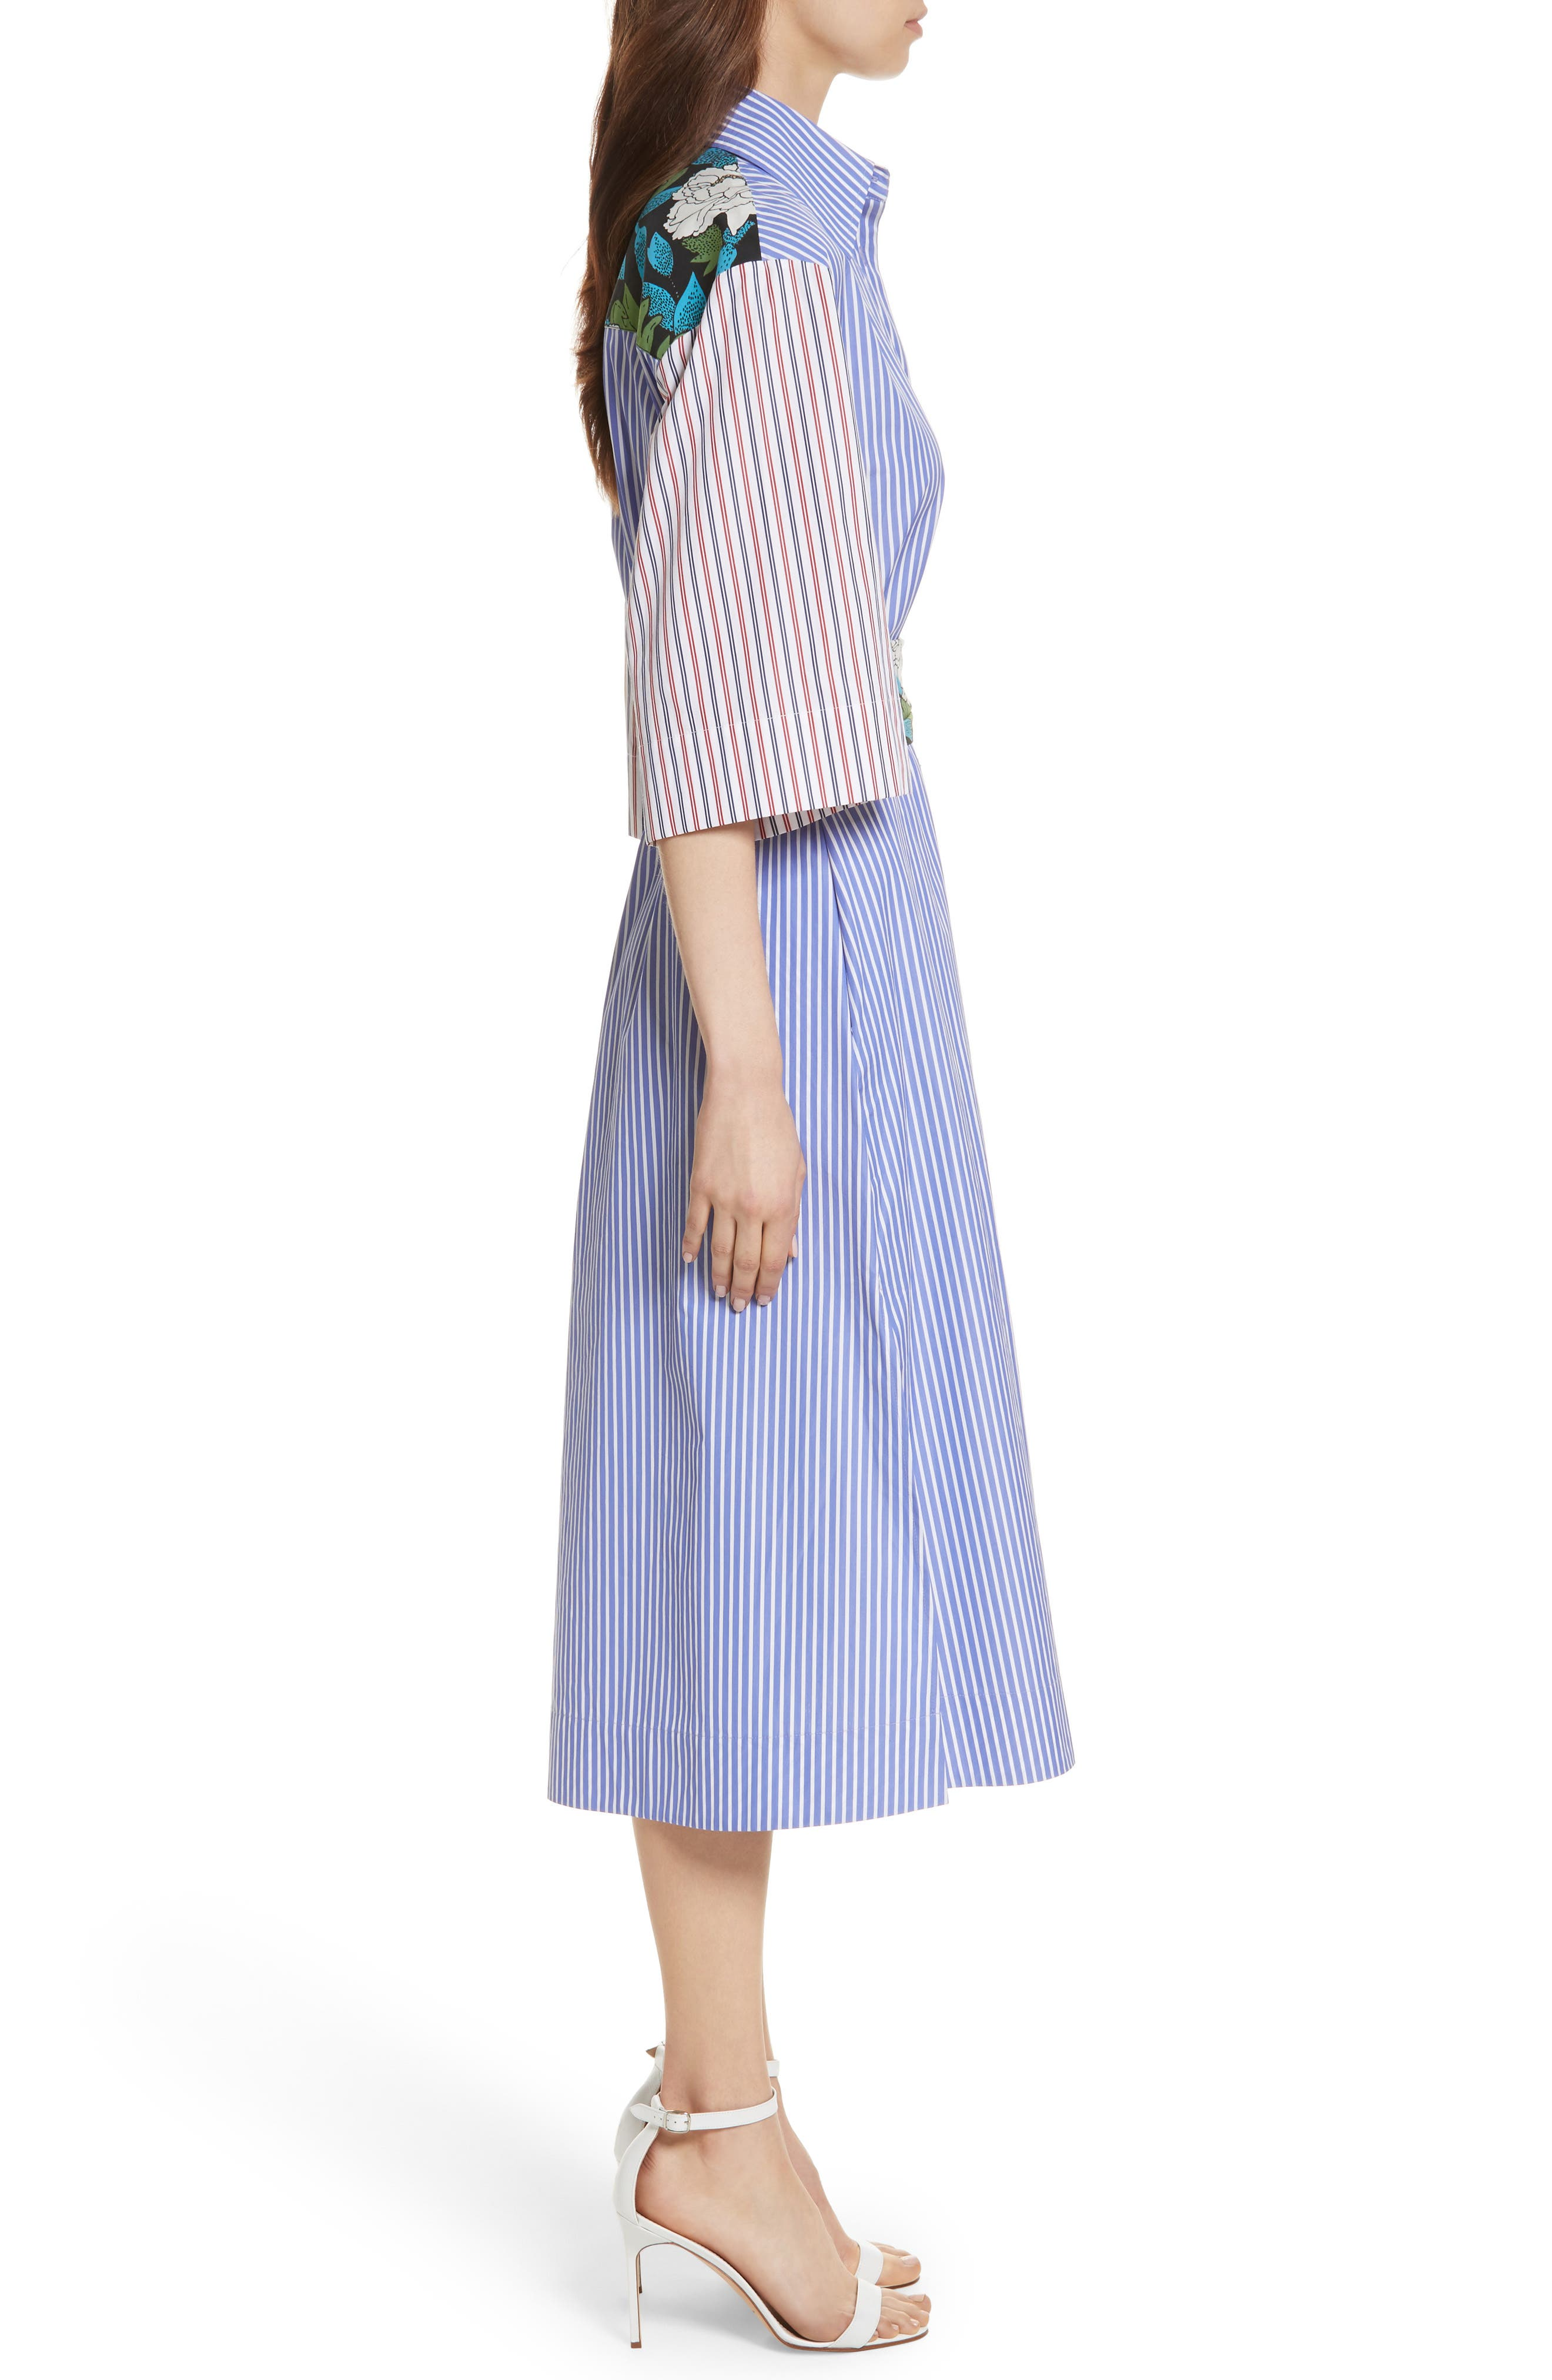 Diane von Furstenberg Mixed Print Cotton Shirtdress,                             Alternate thumbnail 3, color,